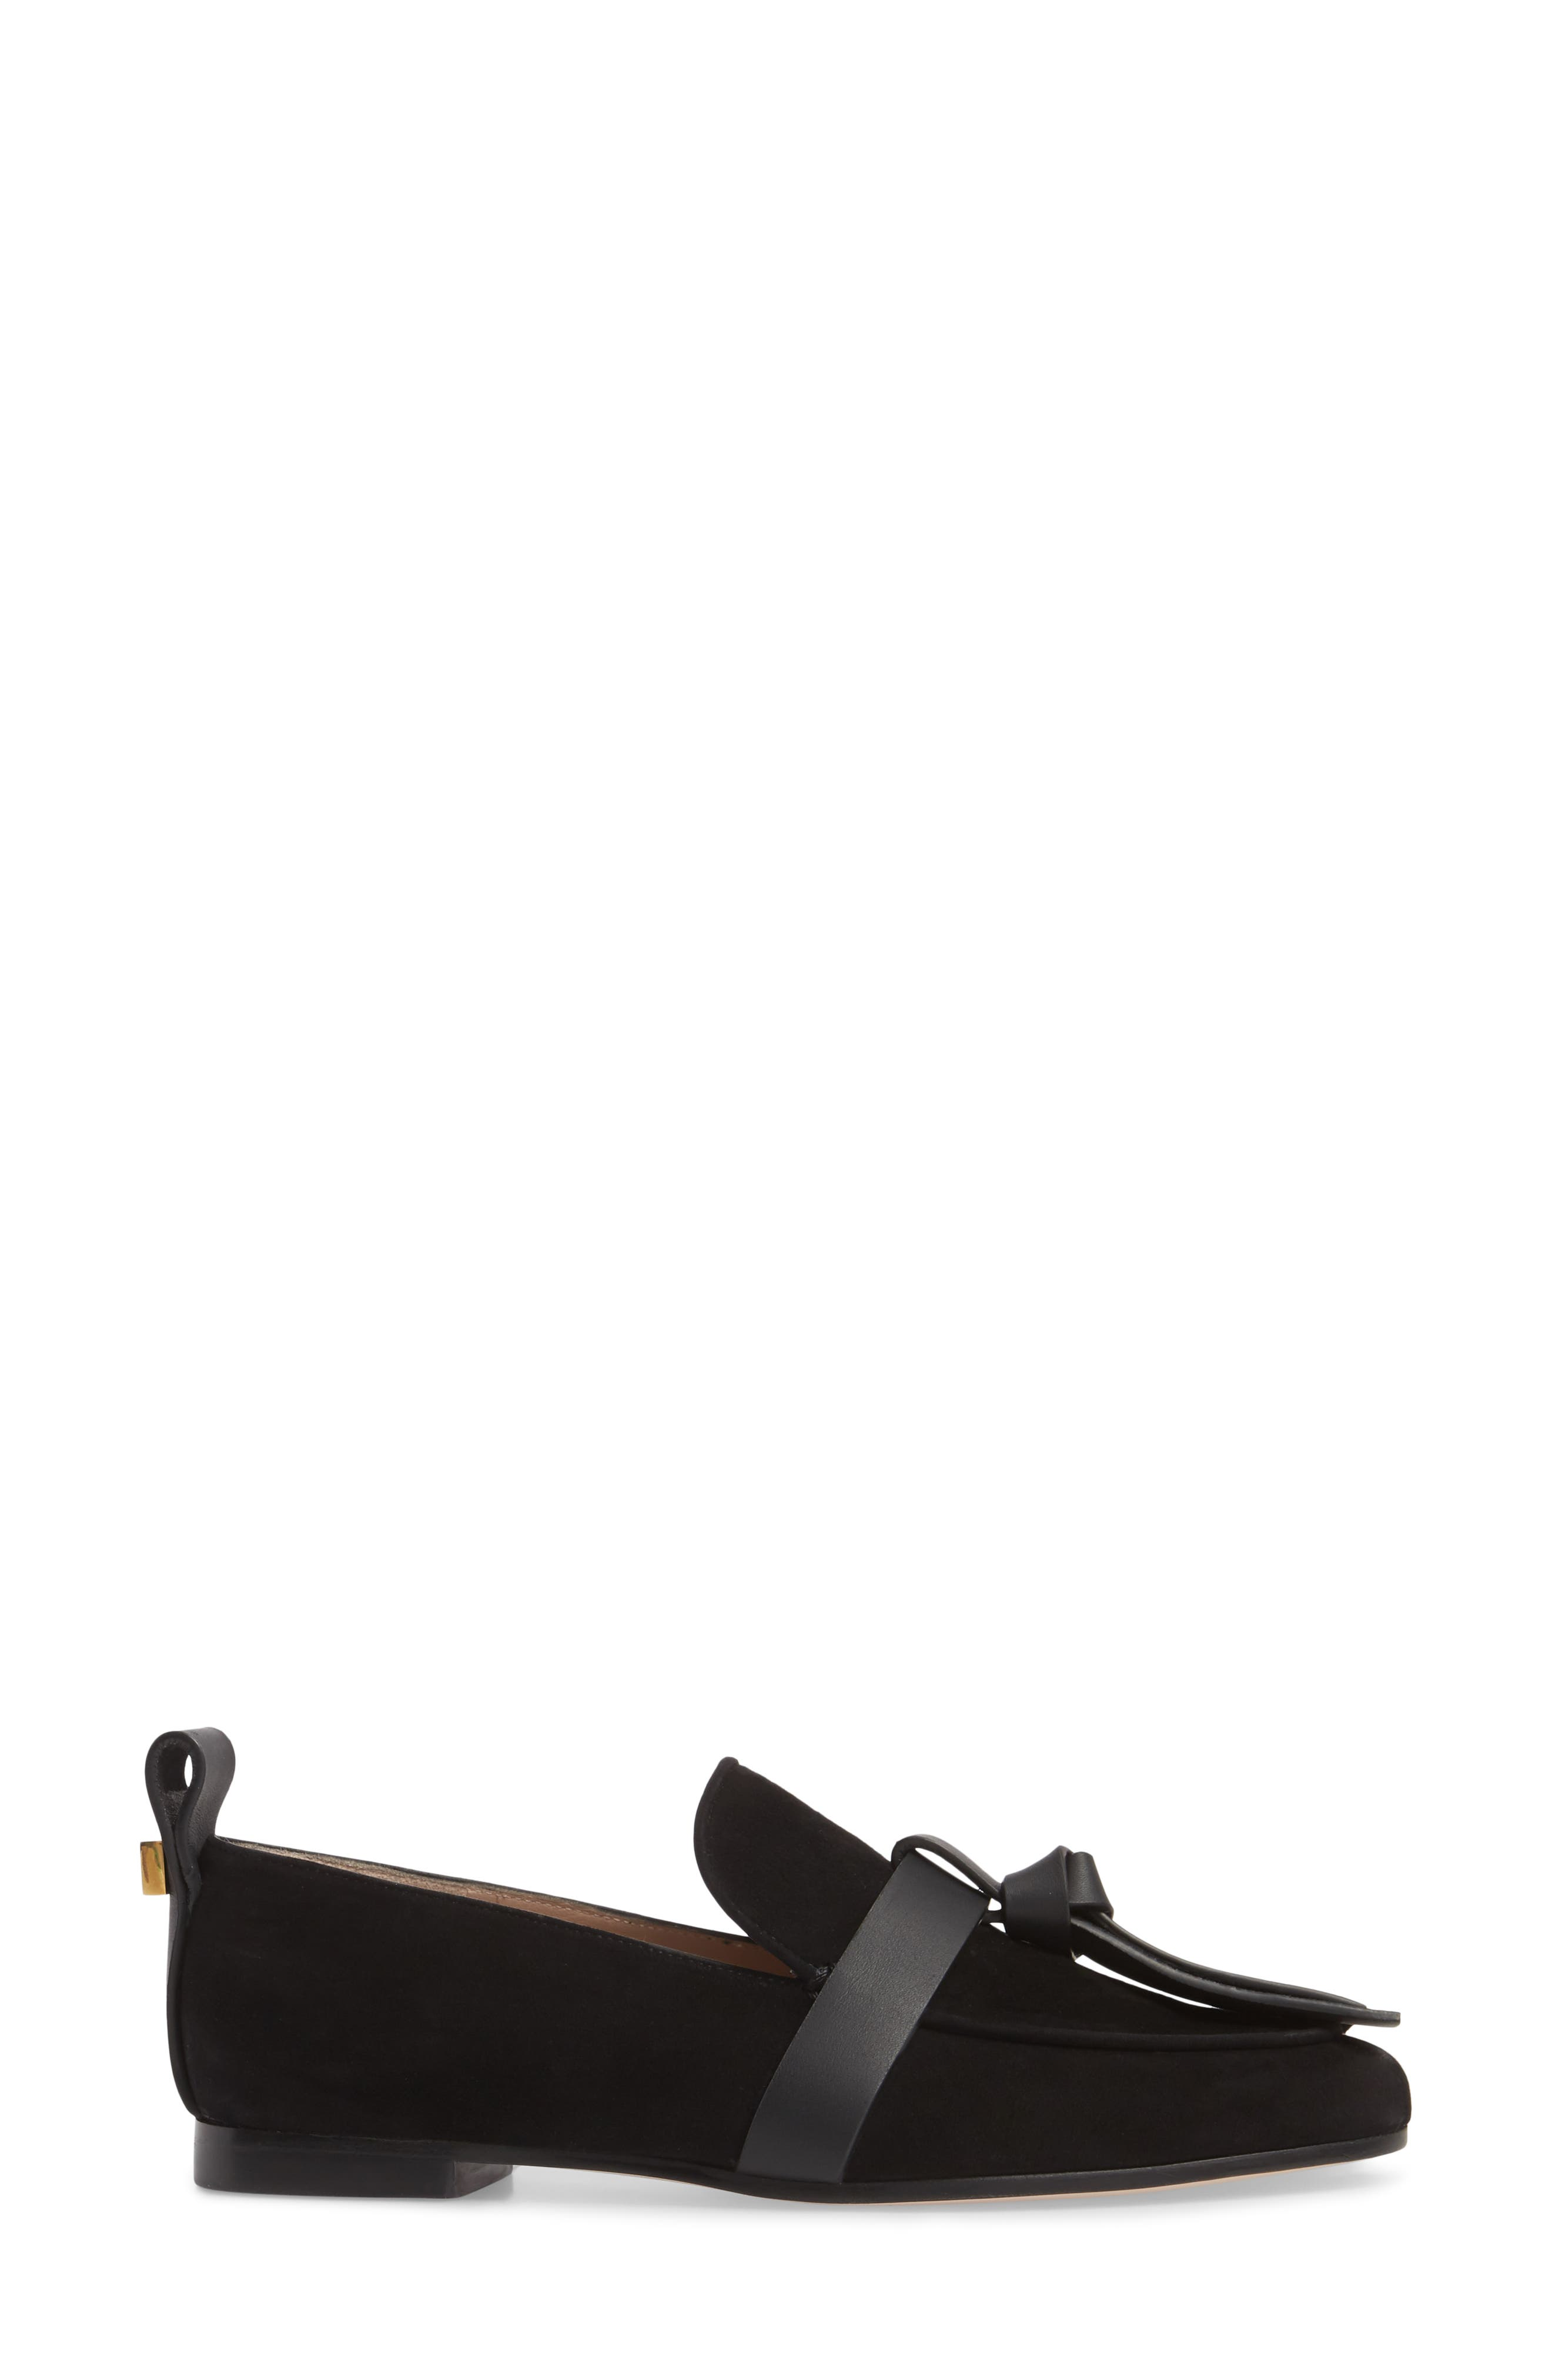 Prescott Knotted Loafer,                             Alternate thumbnail 3, color,                             Black Suede